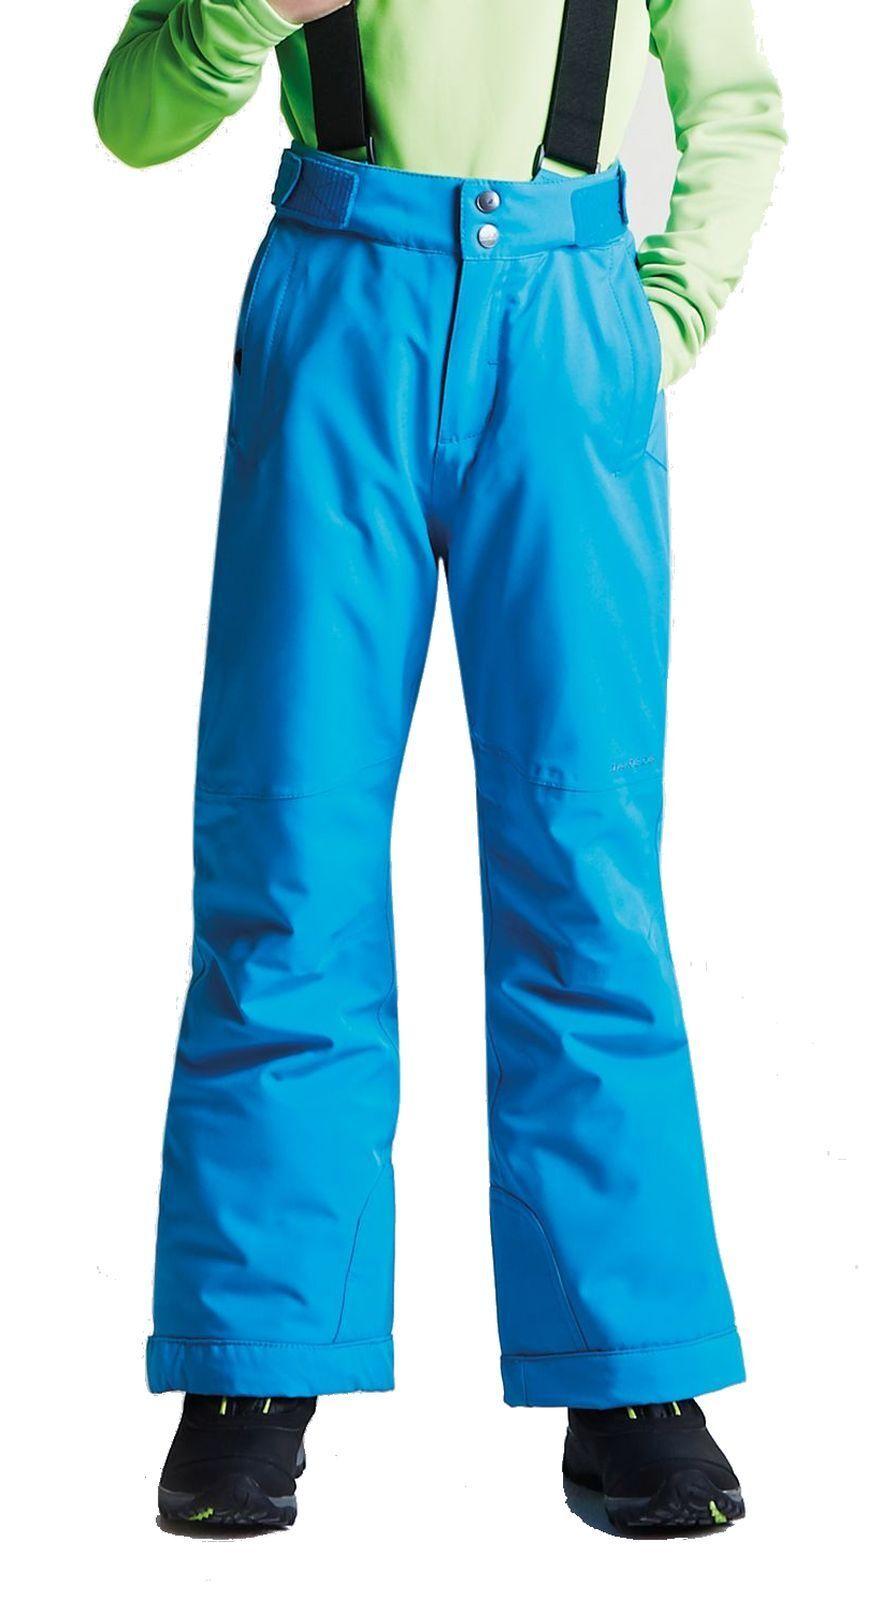 Dare2b Kinder Ski Hose Skihose TAKE ON PANT fluro bluee